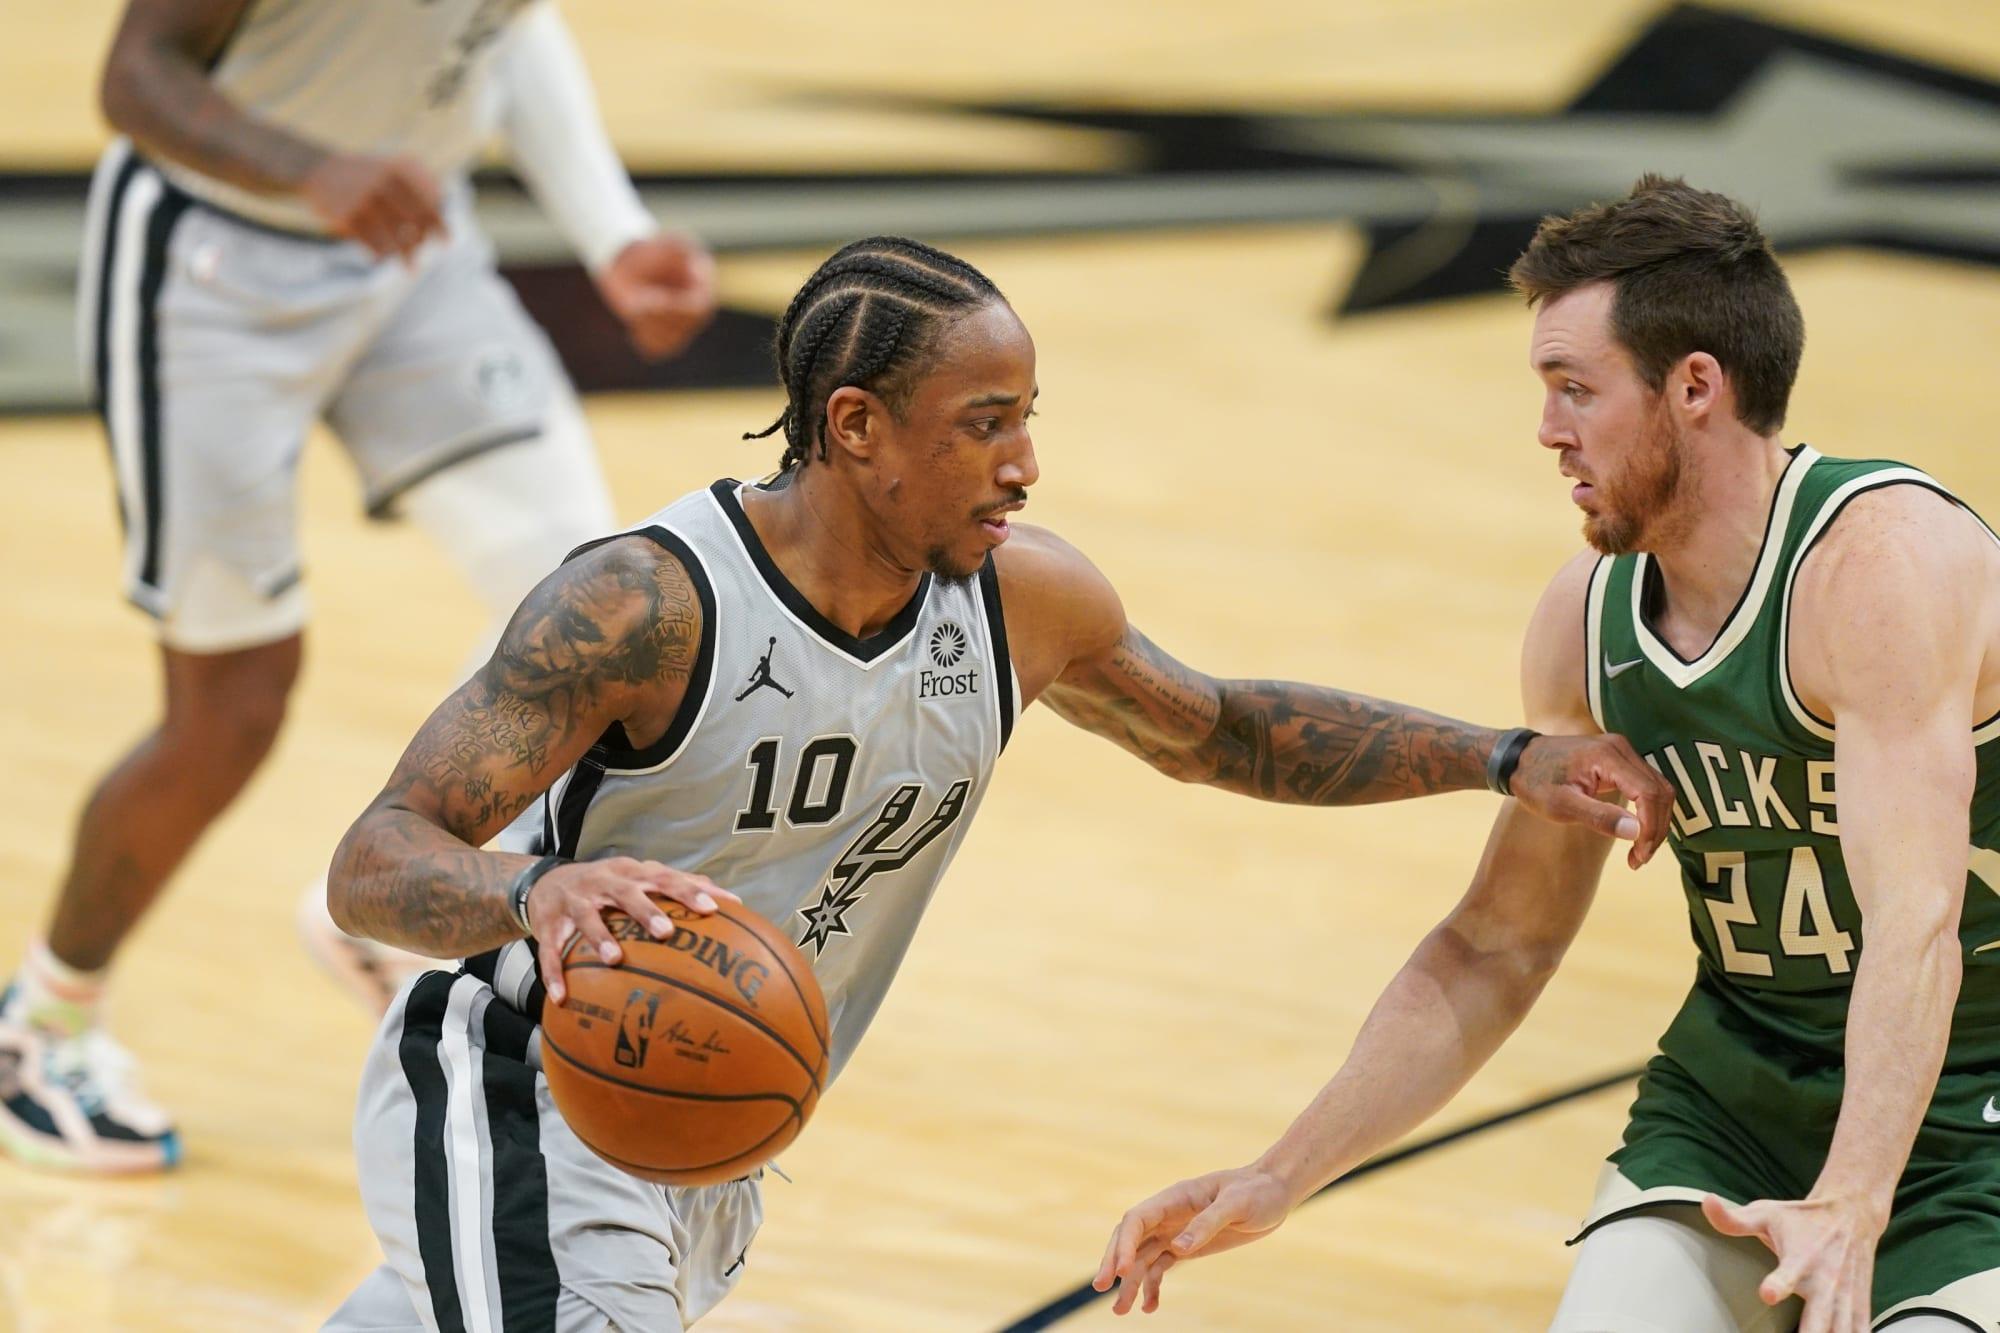 NBA rumors: DeMar DeRozan and Kyle Lowry want to play in LA